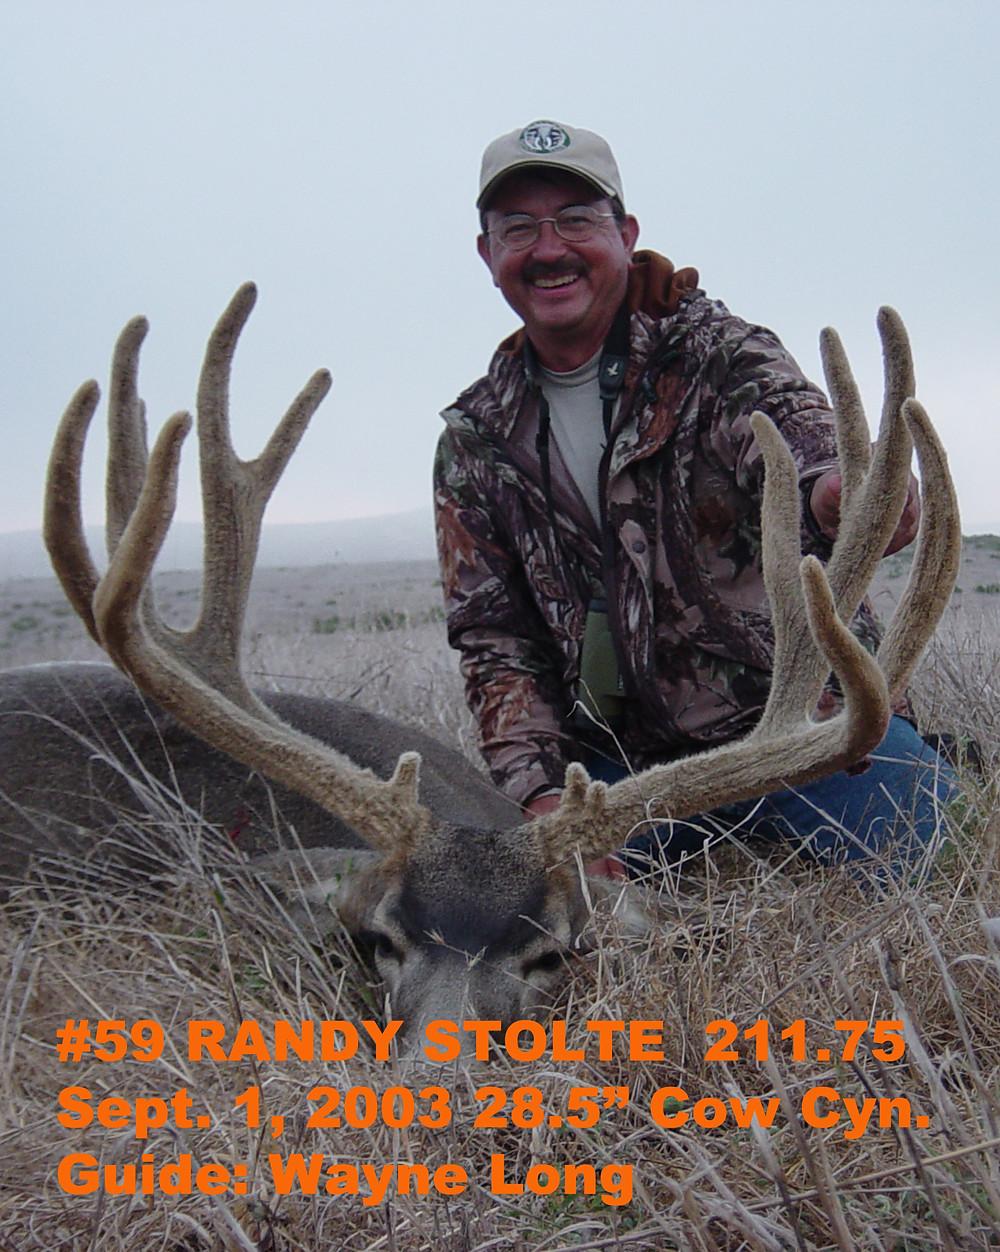 #59 Randy Stolte03.jpg